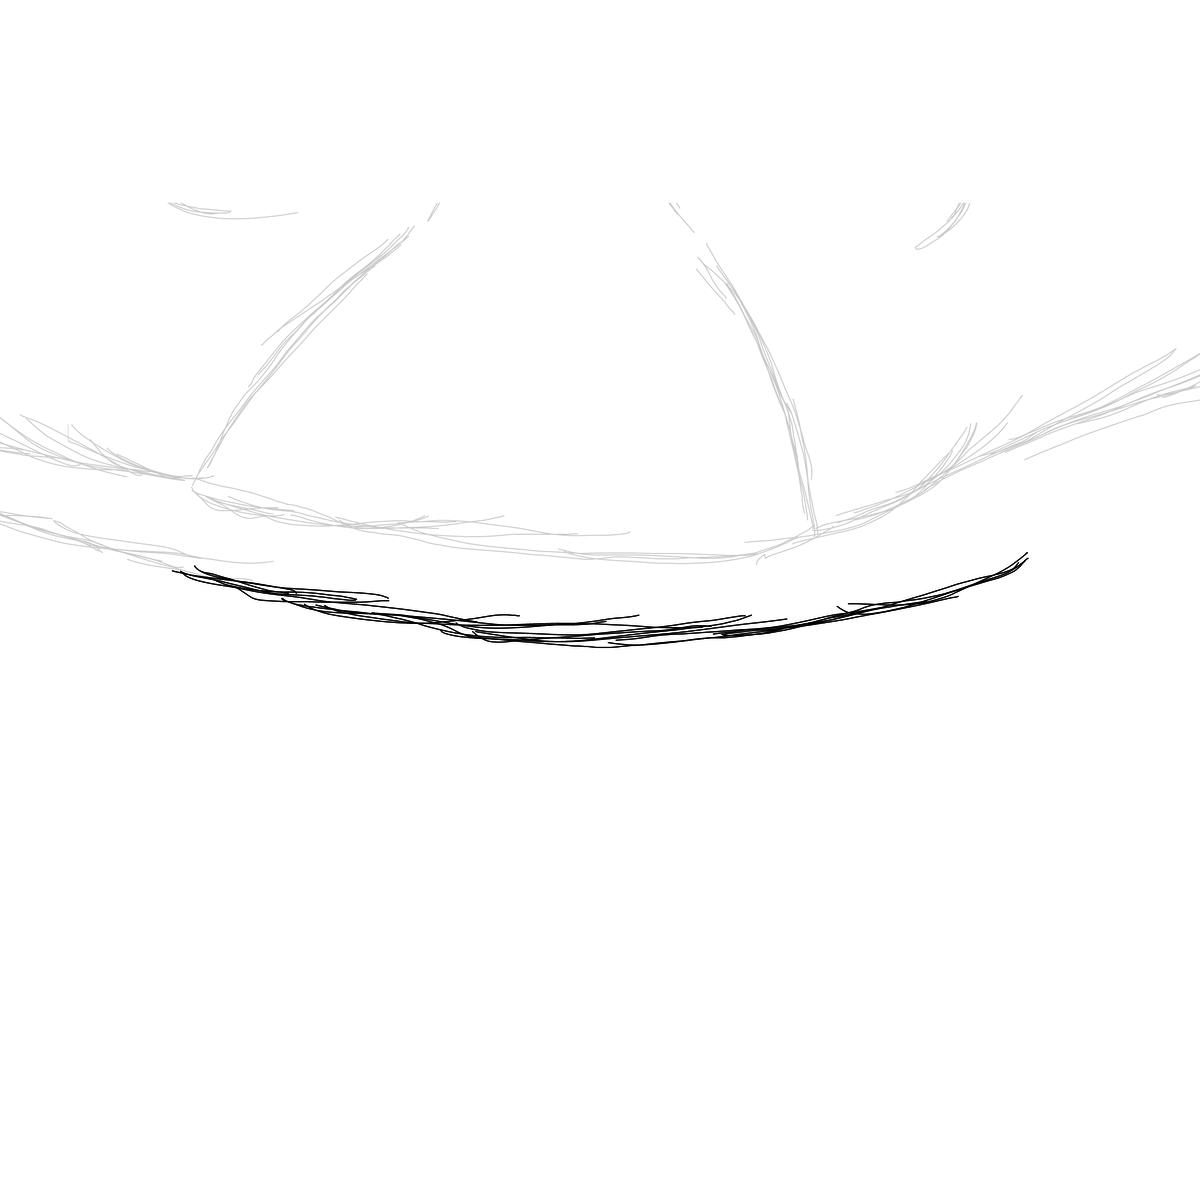 BAAAM drawing#18881 lat:-23.5477905273437500lng: -46.6354751586914060